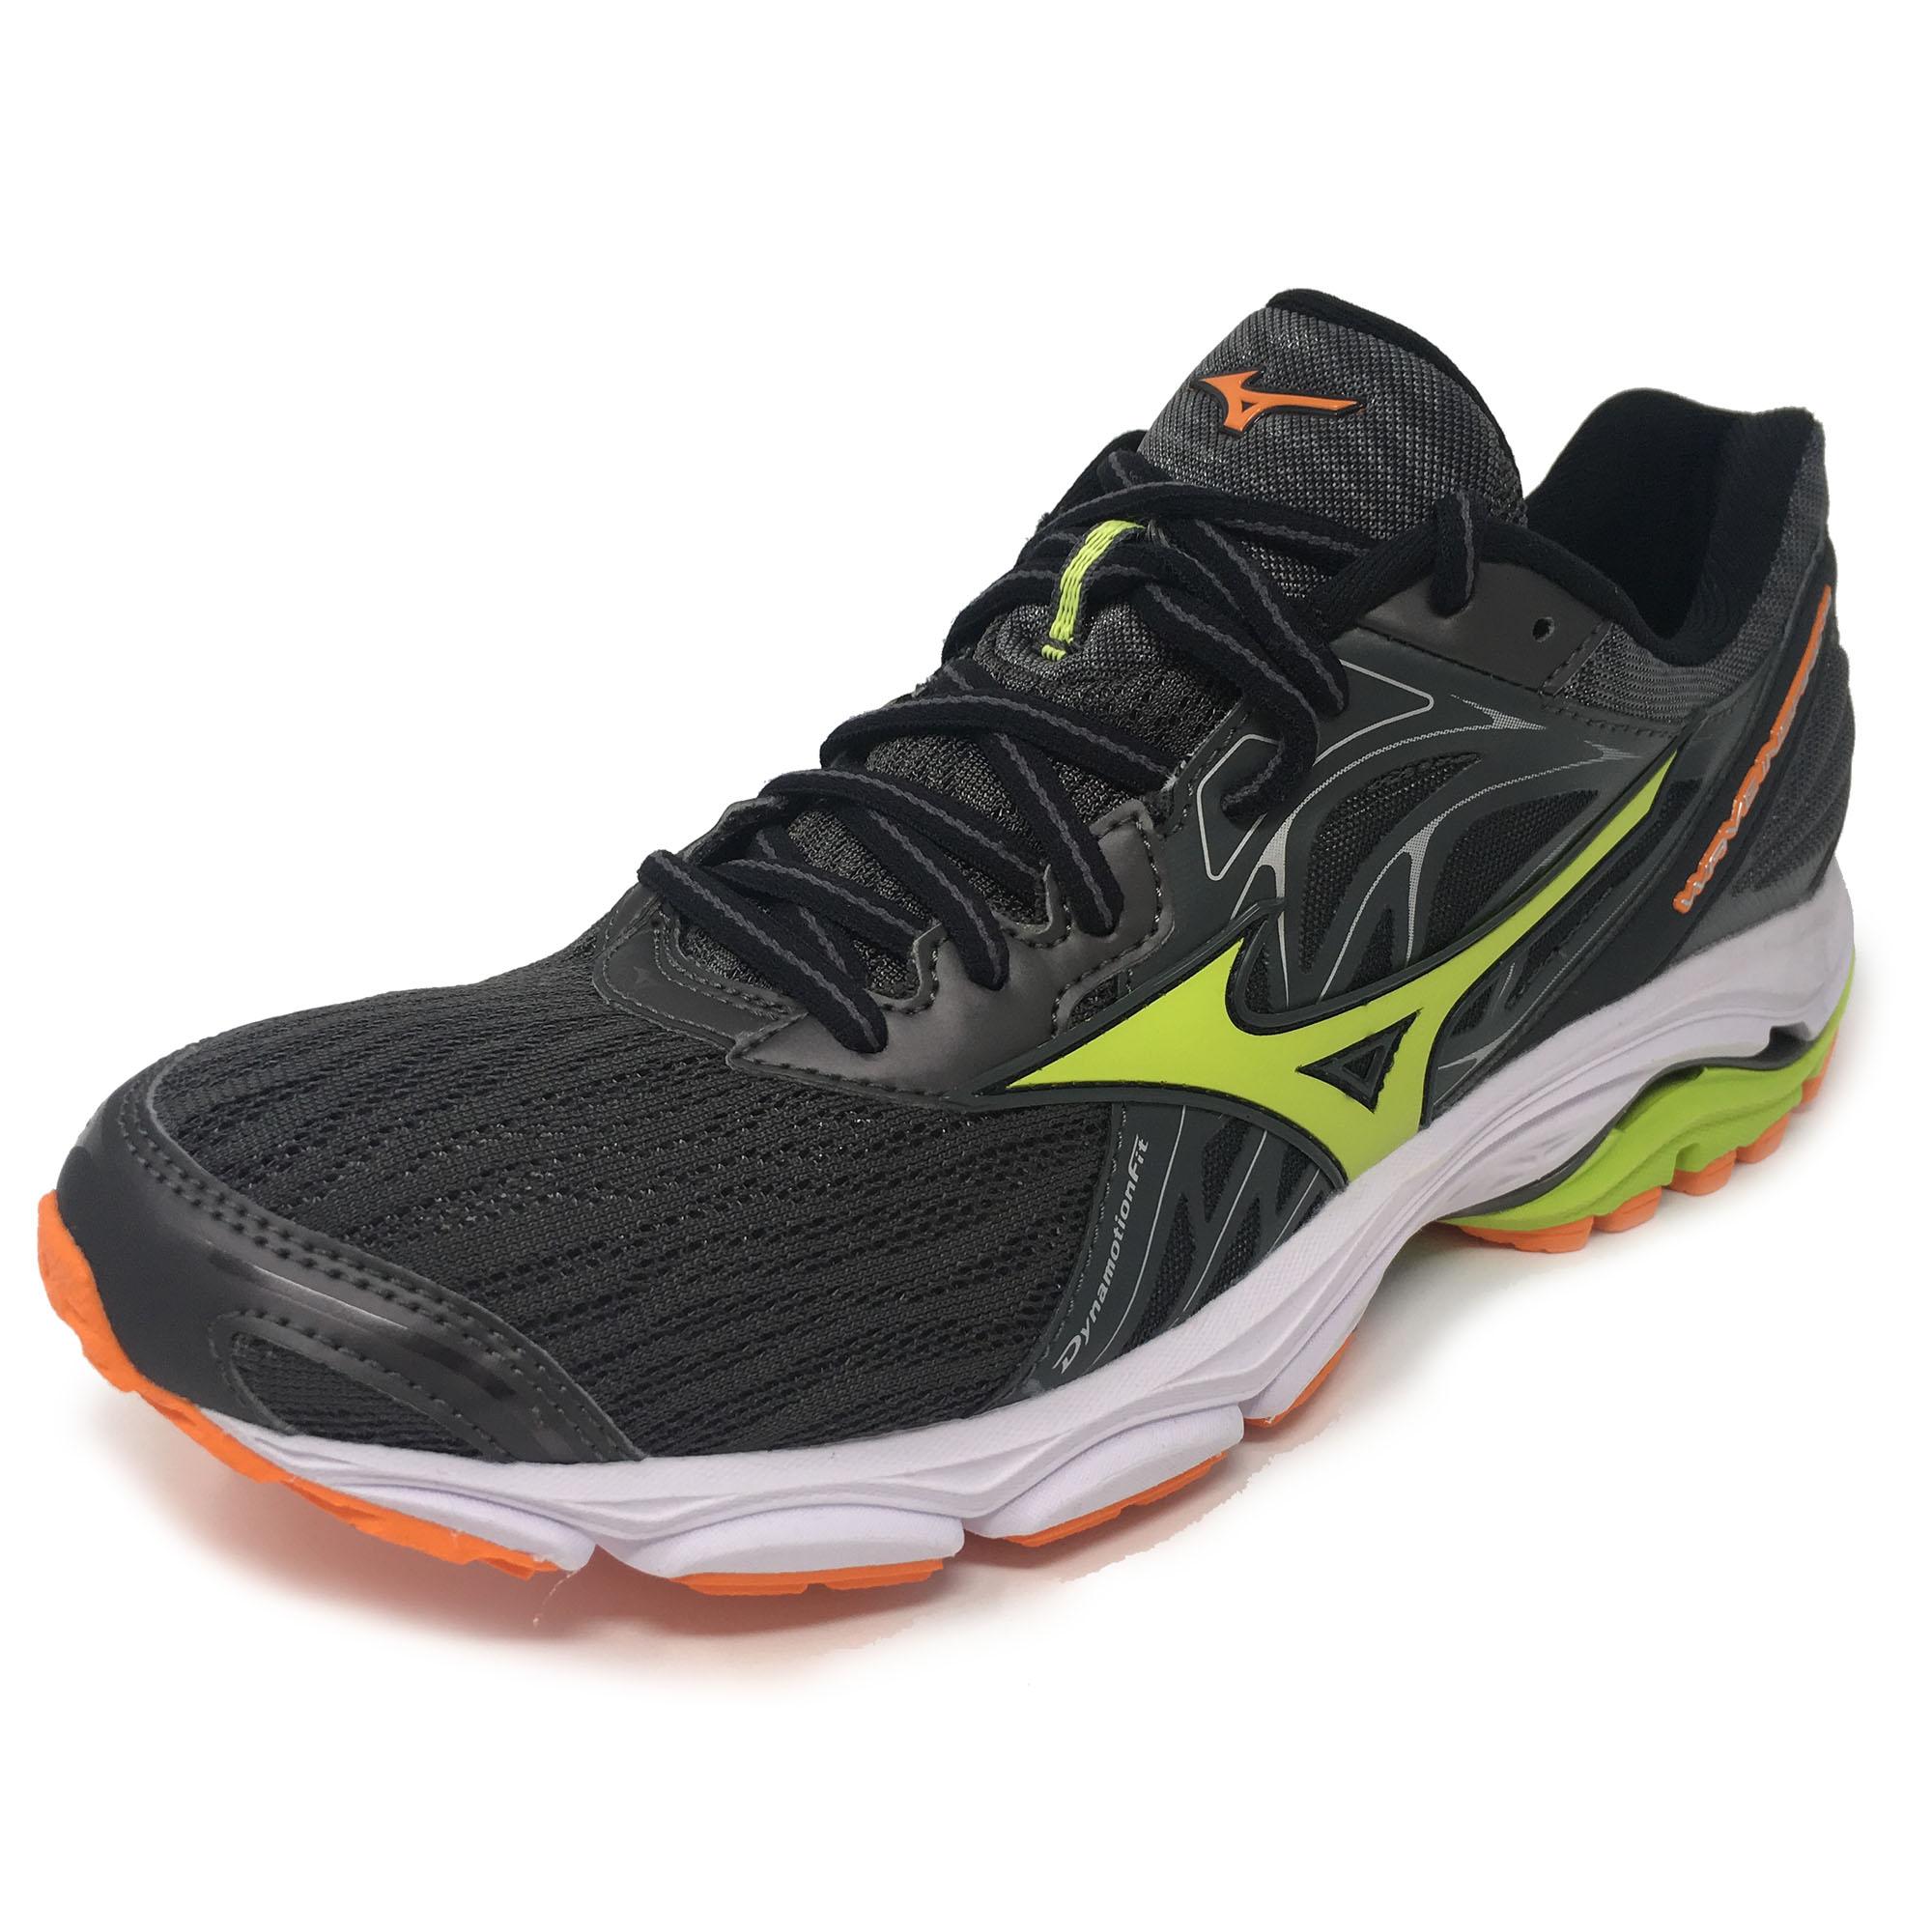 Adidas Shoes Sports Check